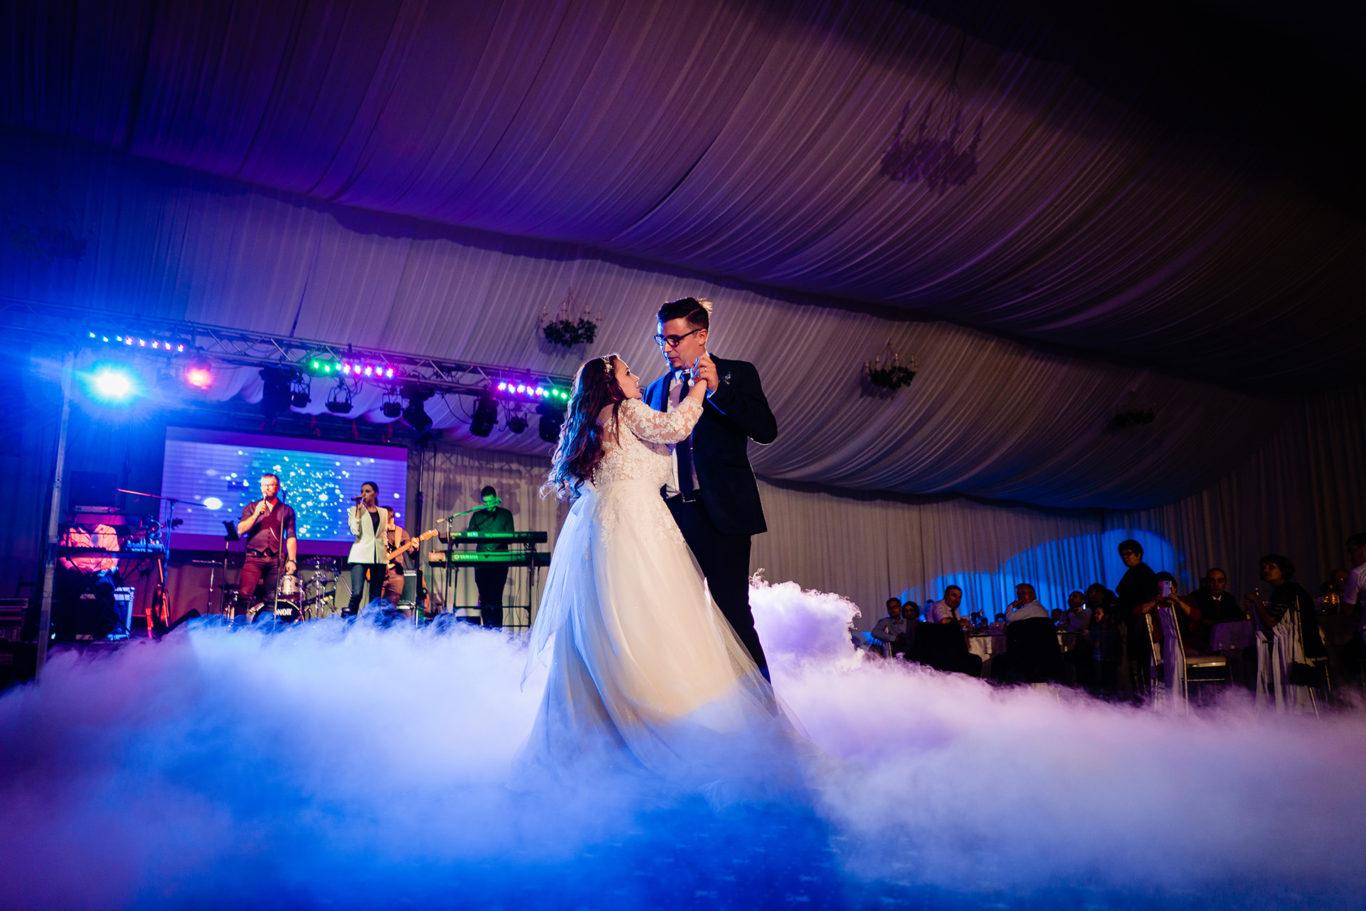 Nunta la Buzau - Alexandra & Leonard - fotograf nunta Ciprian Dumitrescu - fotograf nunta Buzau - fotografie nunta Buzau - fotoreportaj nunta Buzau